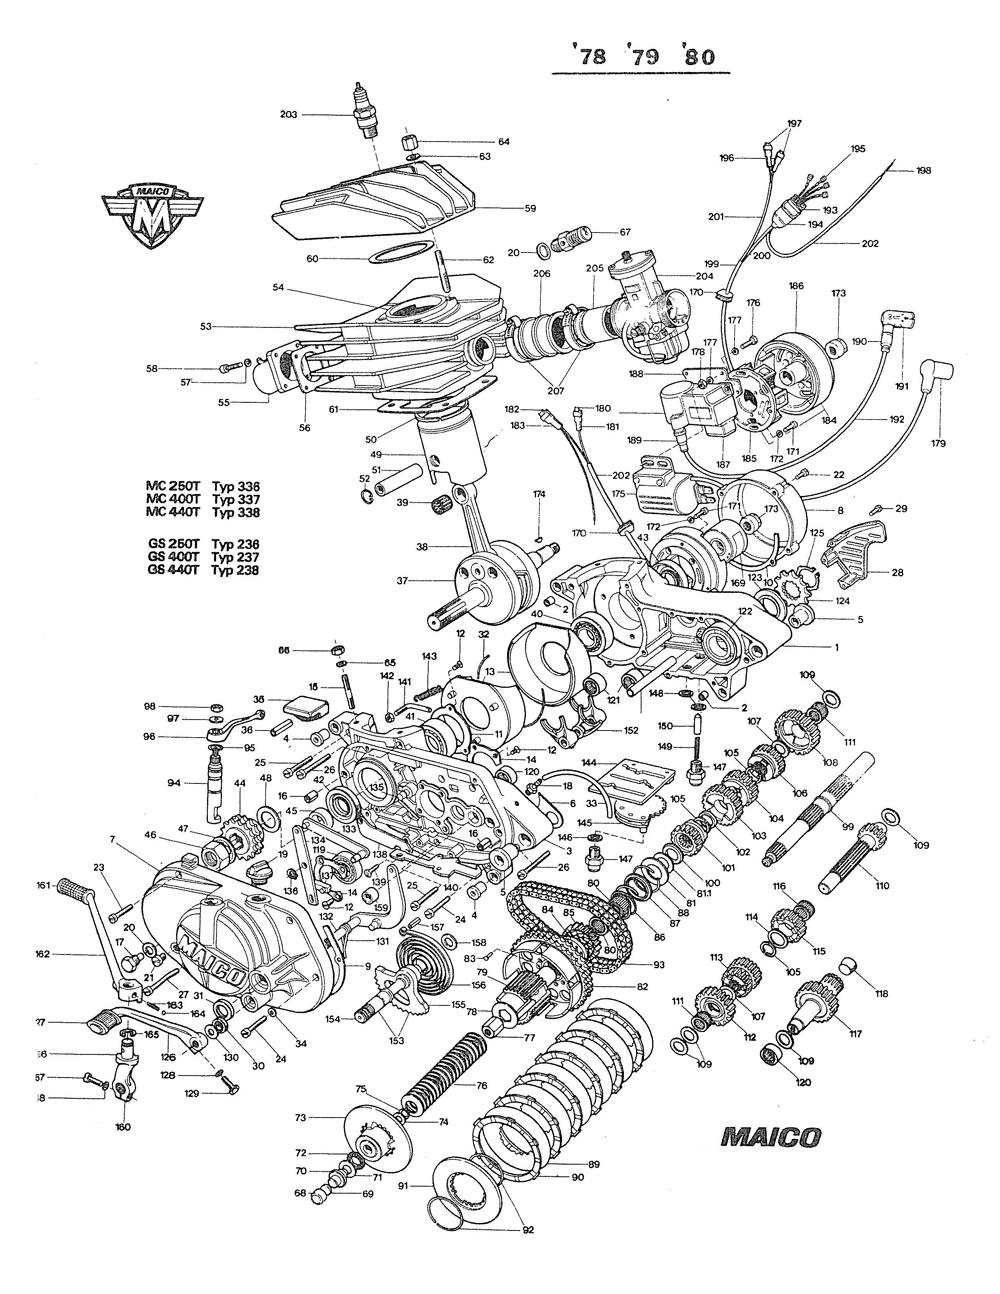 1980 Engine